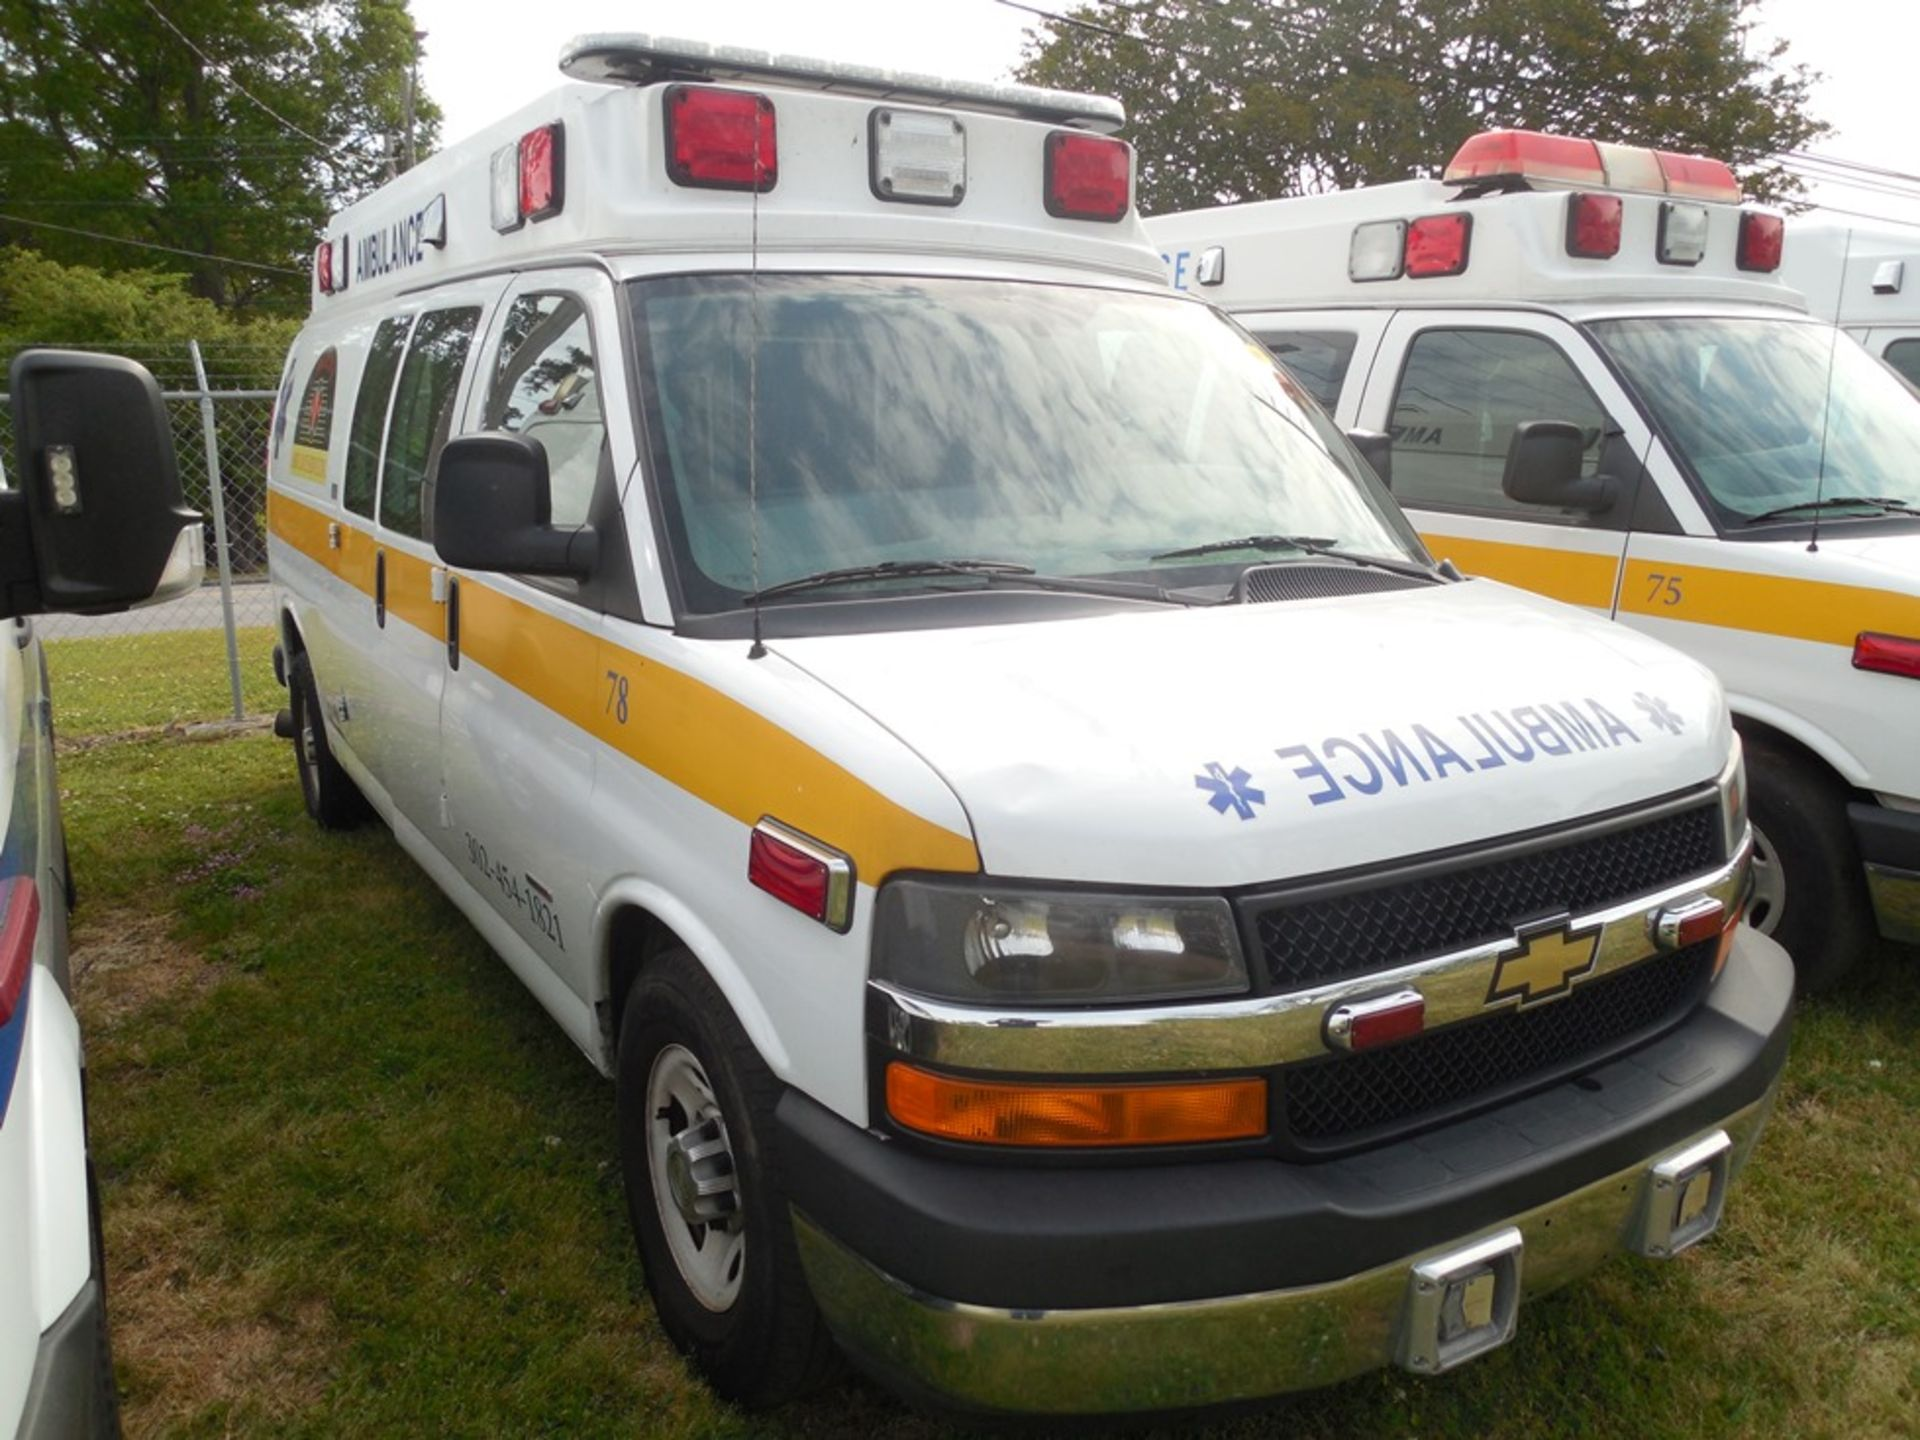 2014 Chev van ambulance dsl, 172,472 miles, vin# 1GBZGUC19E1162022 - Image 3 of 6